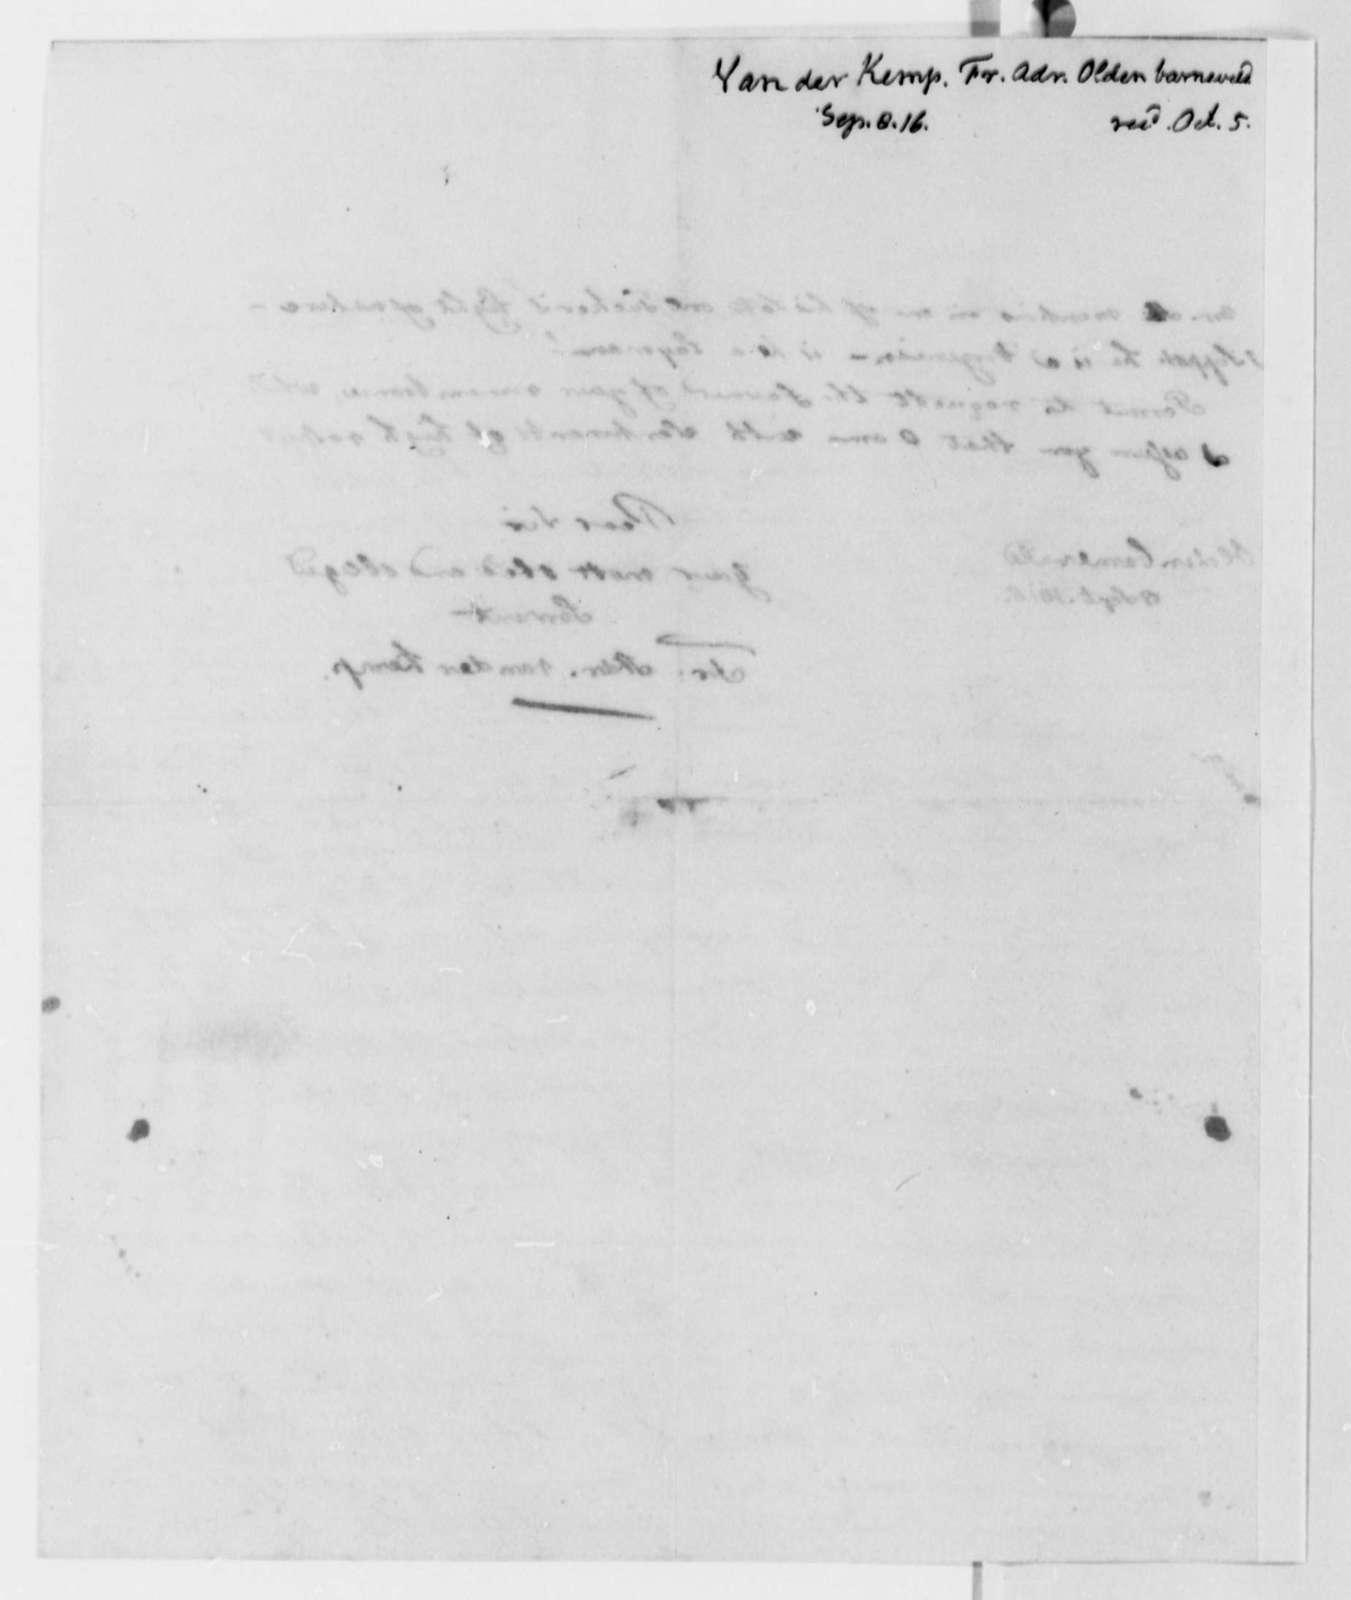 Francis A. van der Kemp to Thomas Jefferson, September 8, 1816